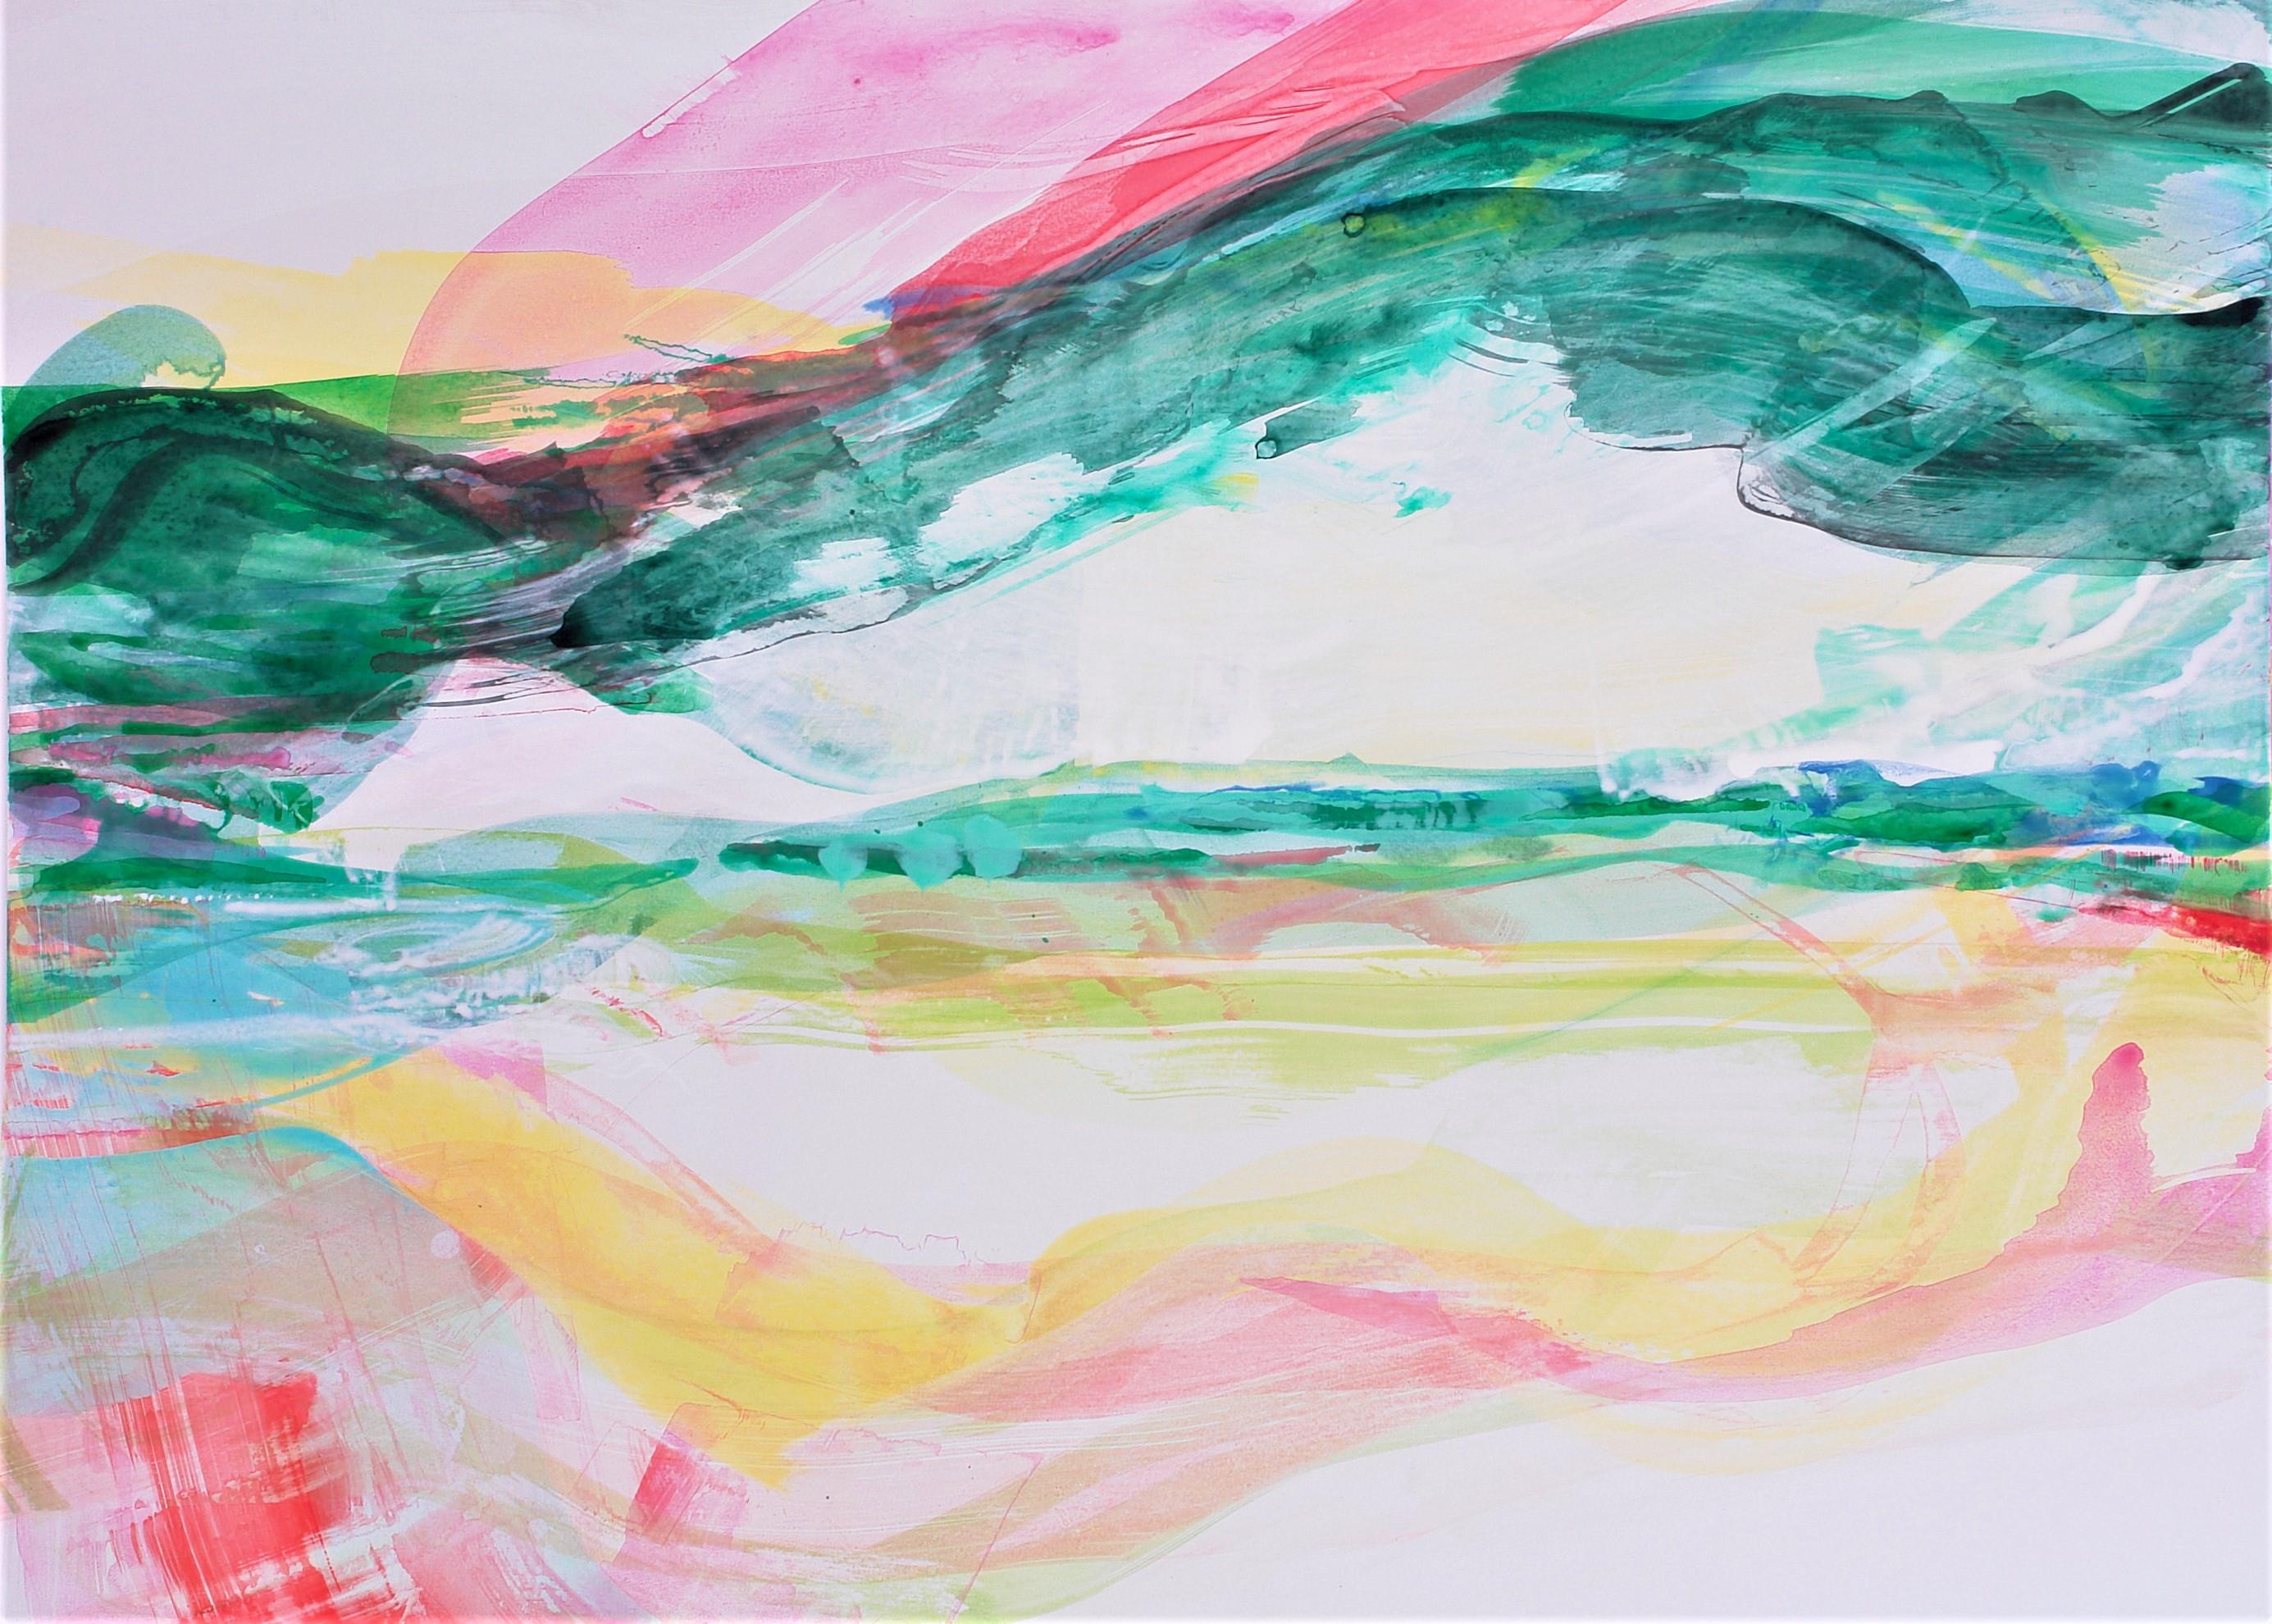 Bergwiese, 2014, Acryl auf Papier, 85 x 119 cm © Uta Weil, VG Bild-Kunst, Bonn